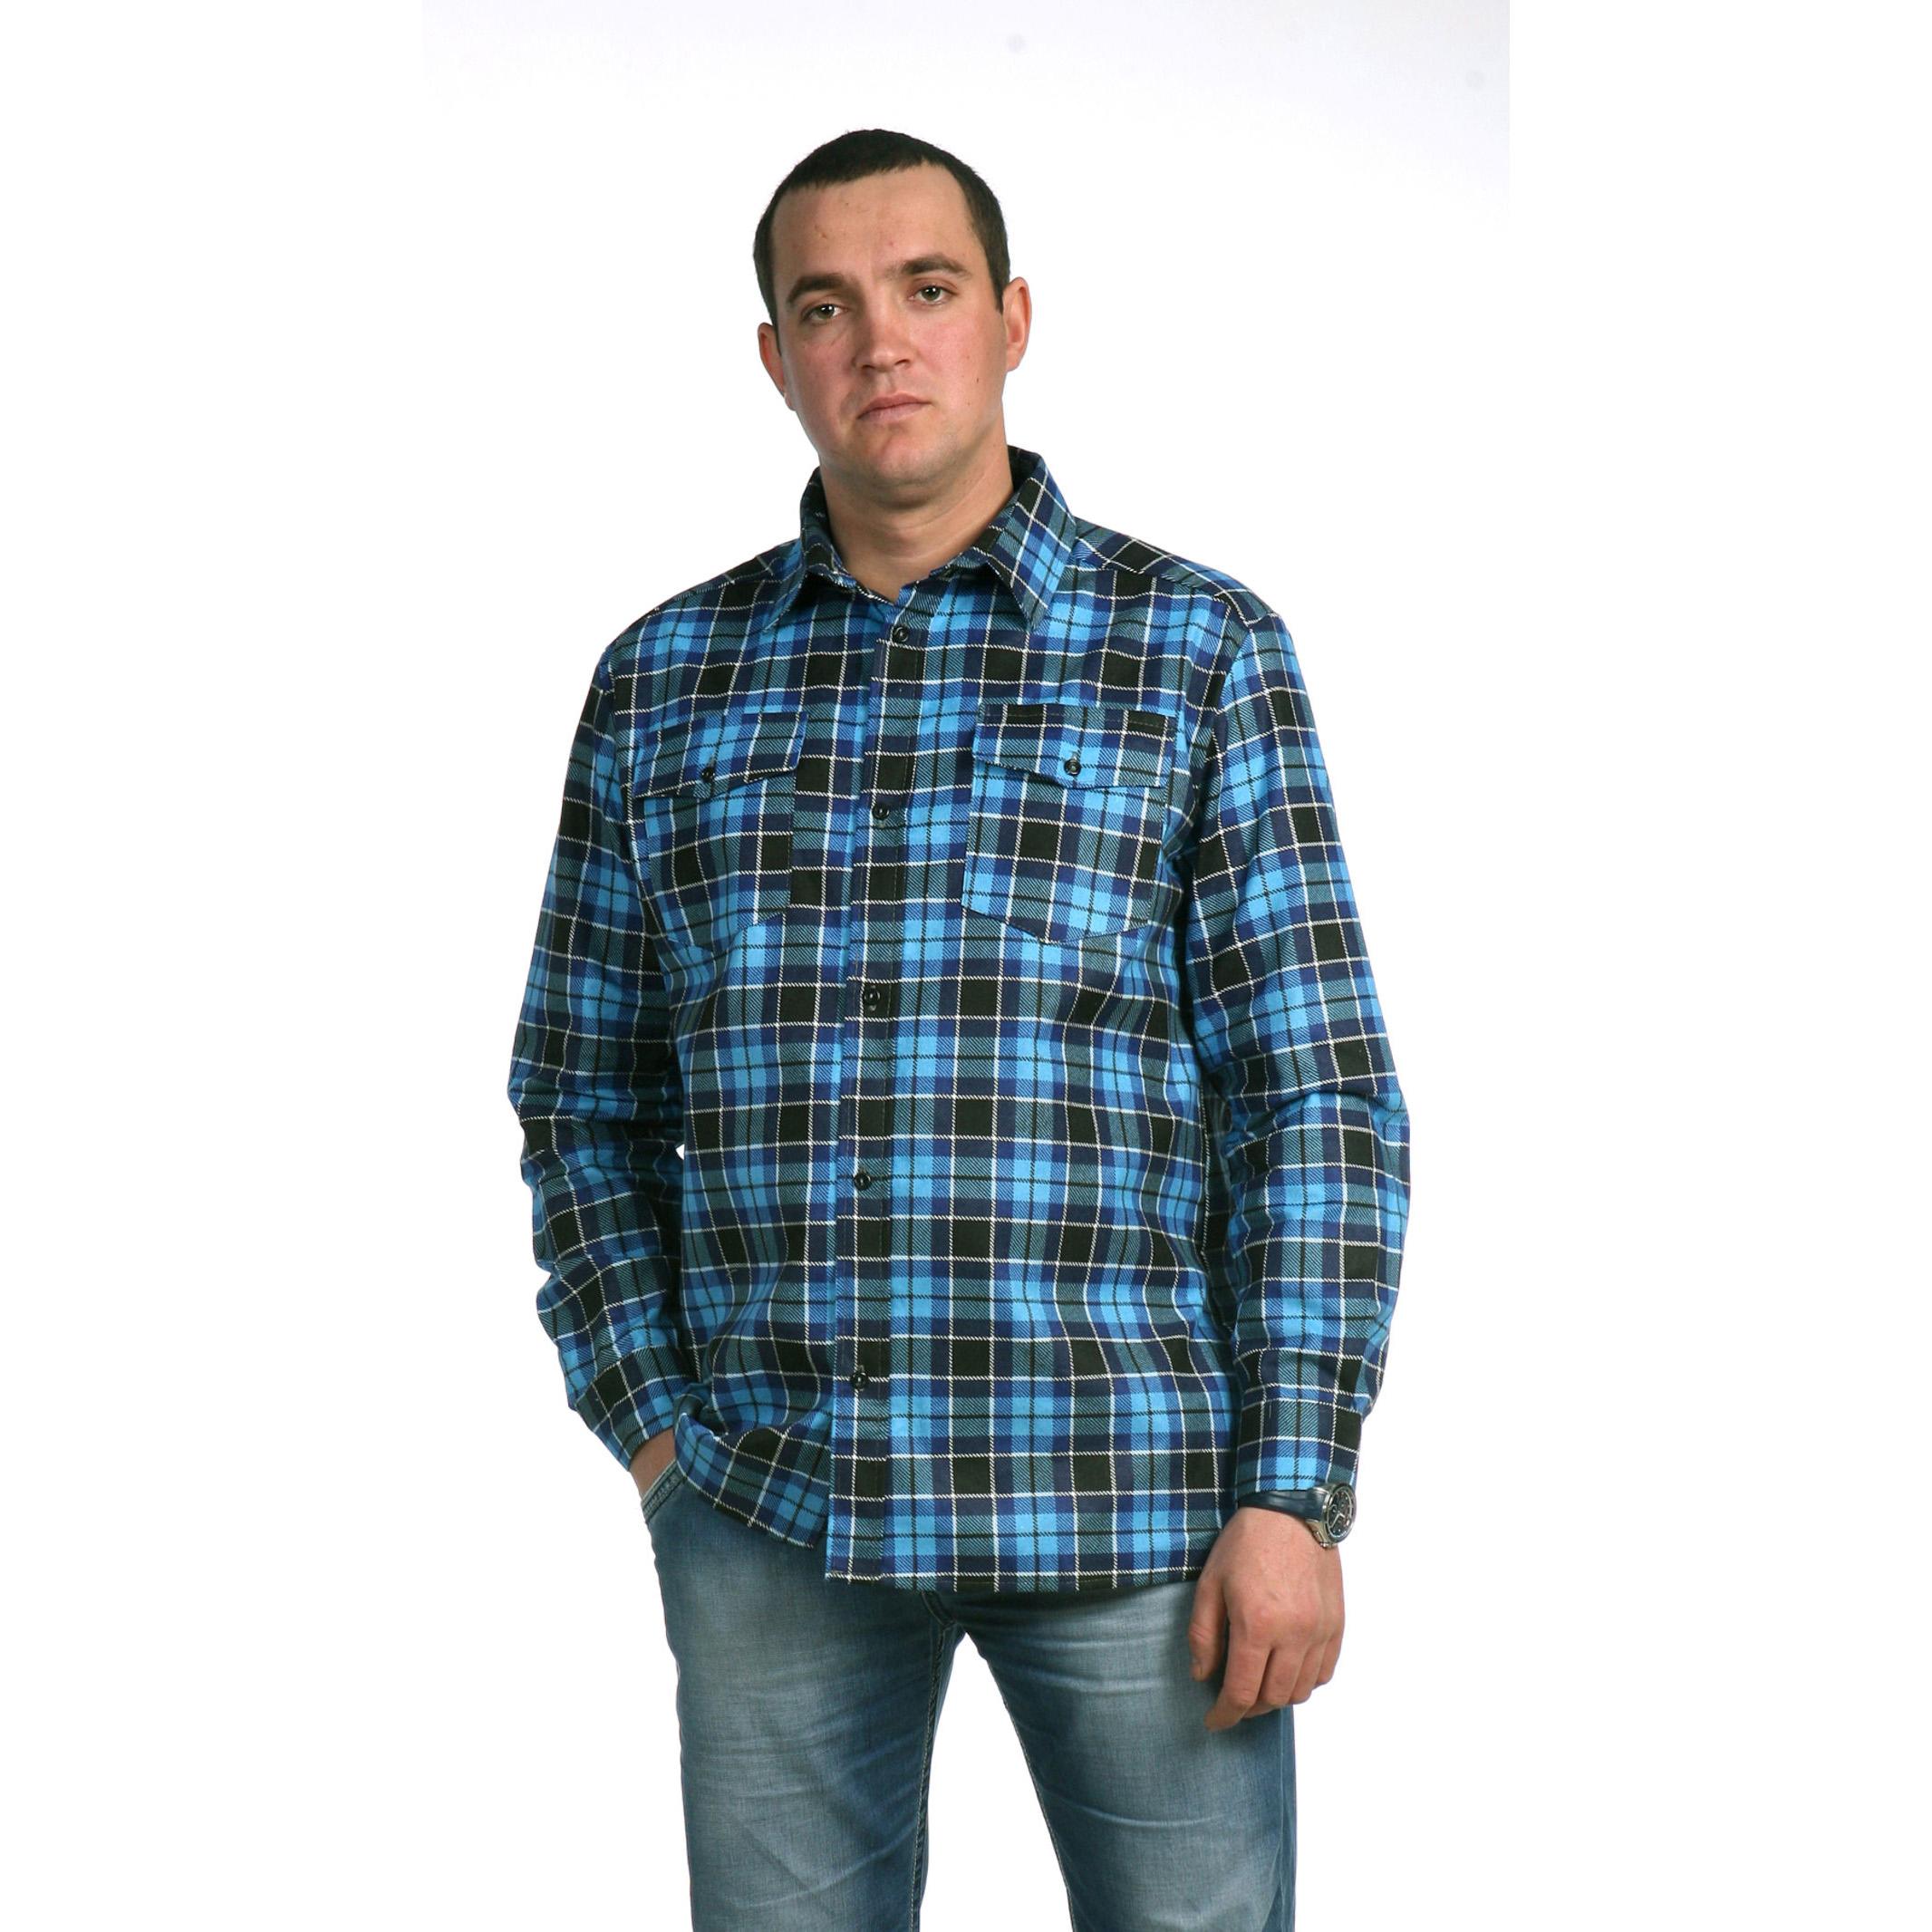 Мужская рубашка «Гарри», размер 52Толстовки, джемпера и рубашки<br>Обхват груди:104 см<br>Обхват талии:96 см<br>Обхват бедер:108 см<br>Обхват шеи, ворот:42 см<br>Рост:176-182 см<br><br>Тип: Муж. рубашка<br>Размер: 52<br>Материал: Фланель